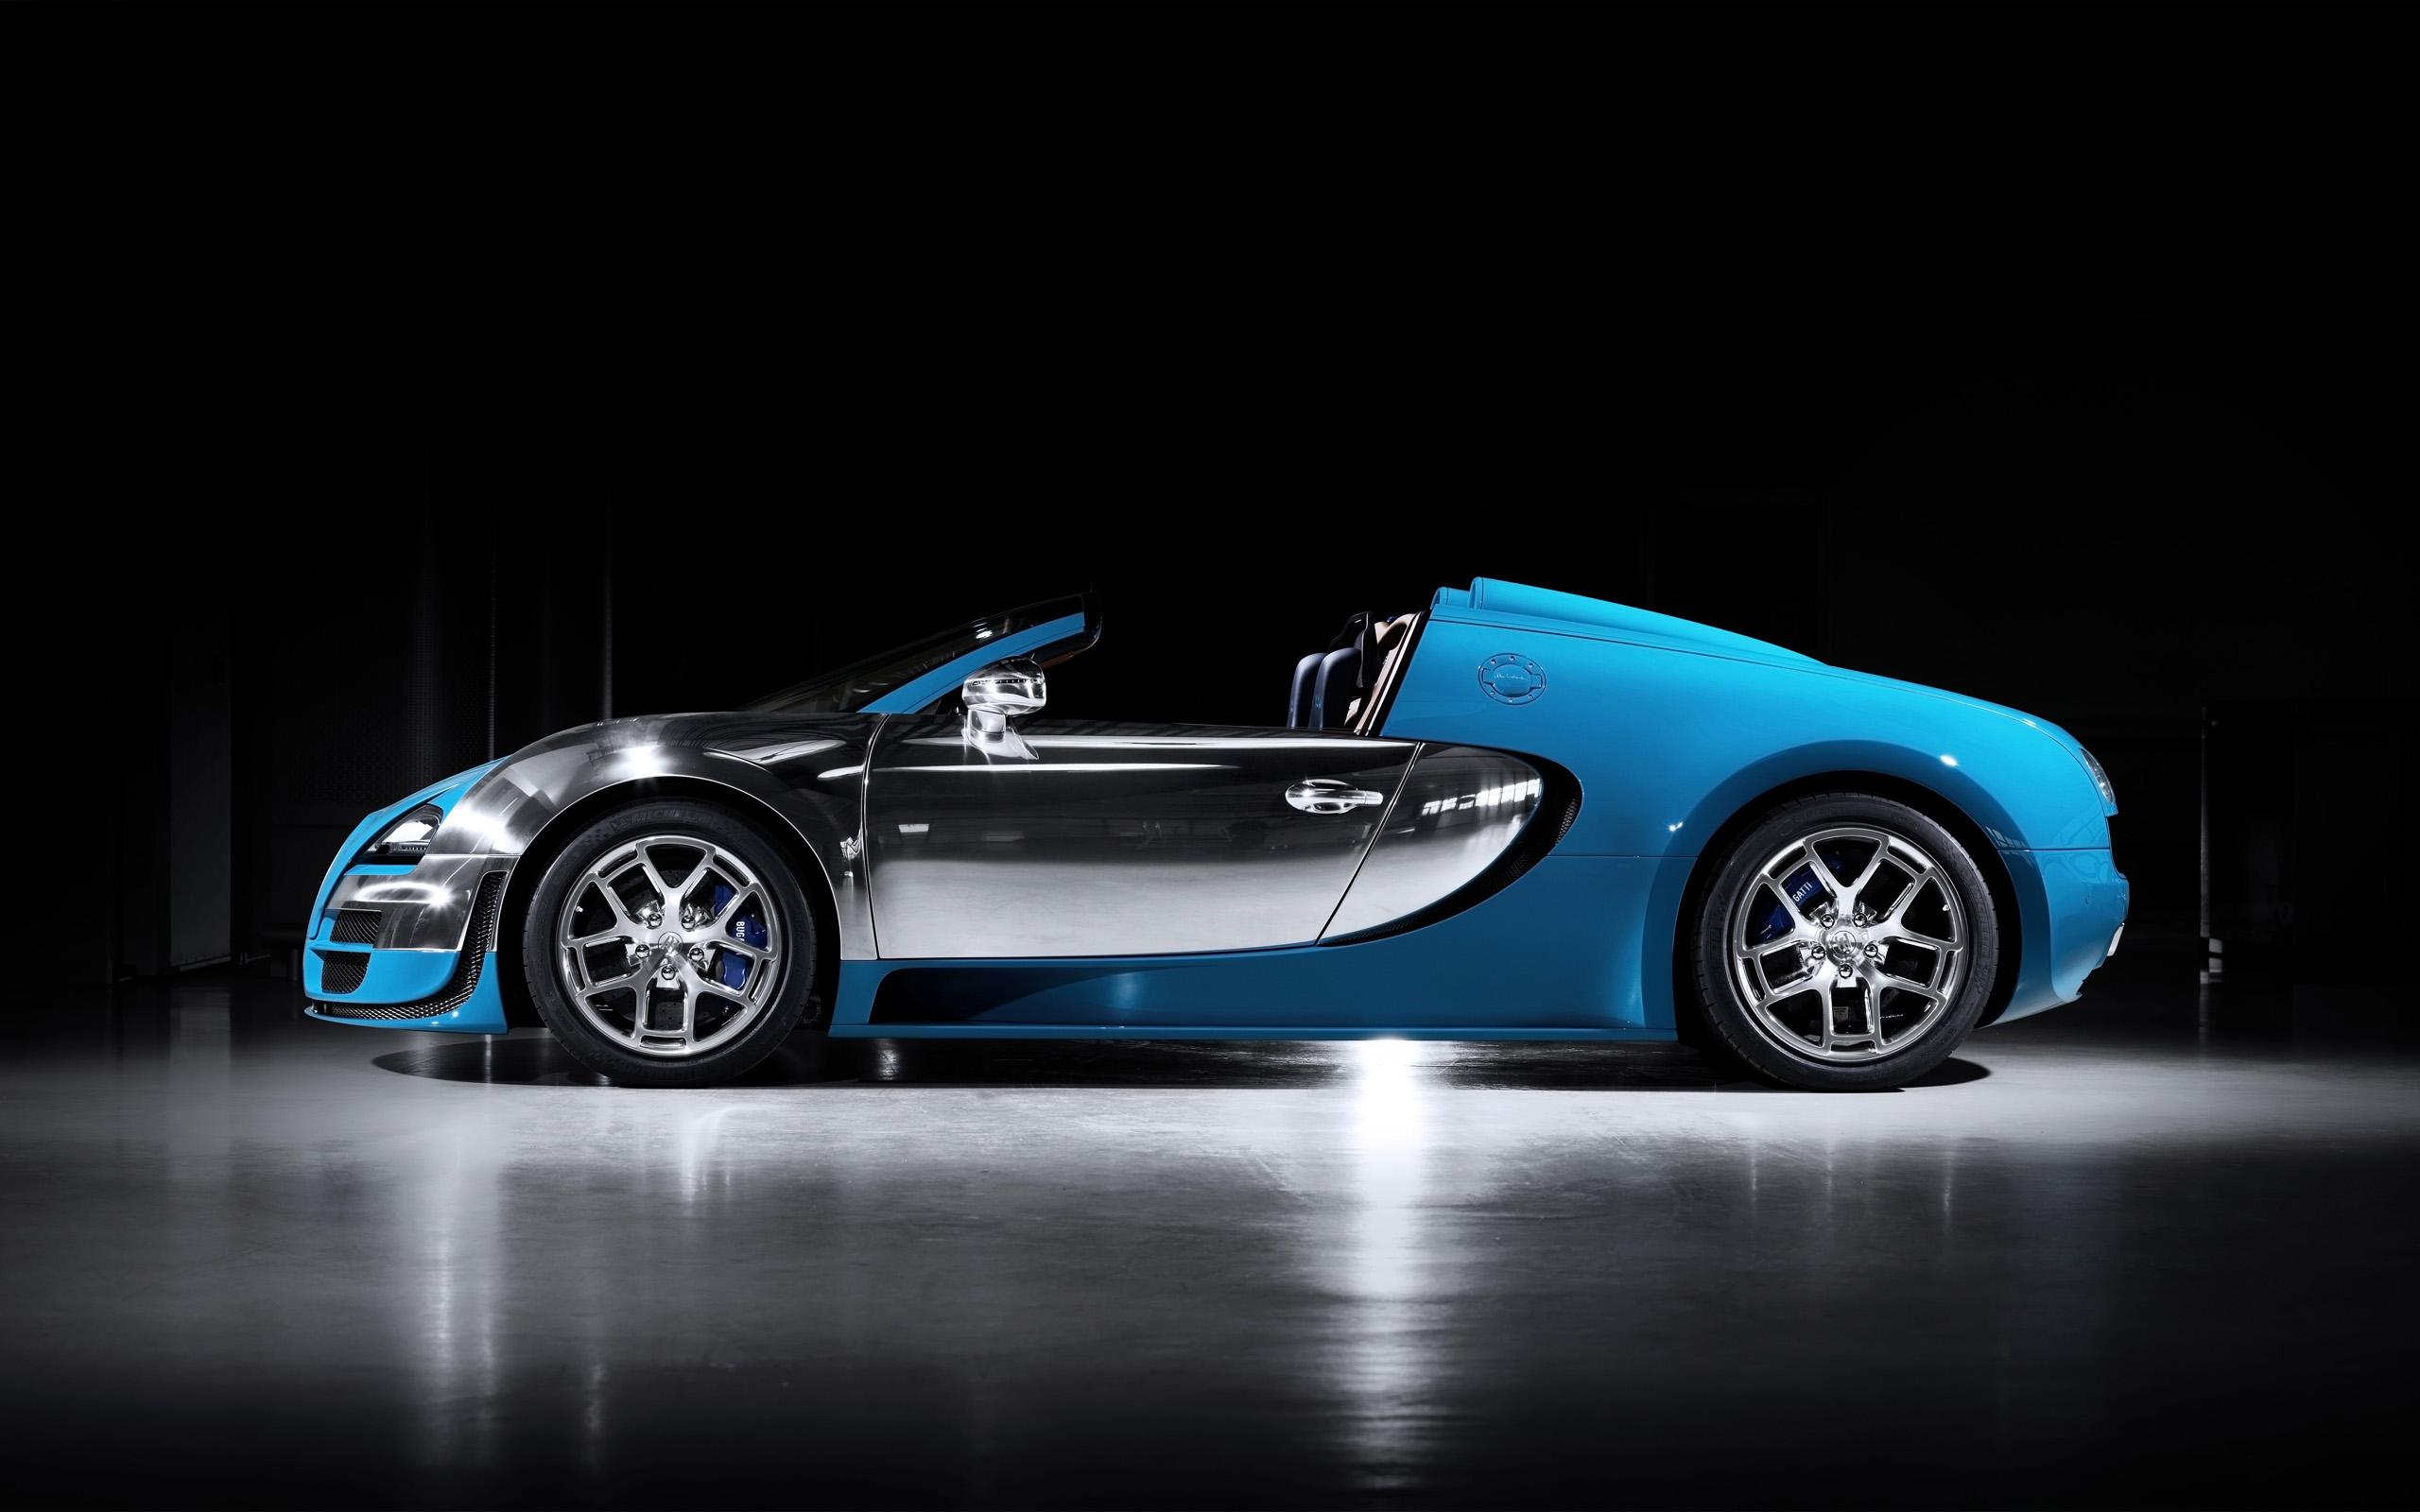 2013 bugatti veyron grand sport vitesse legend meo costantini 3 wallpaper h. Black Bedroom Furniture Sets. Home Design Ideas